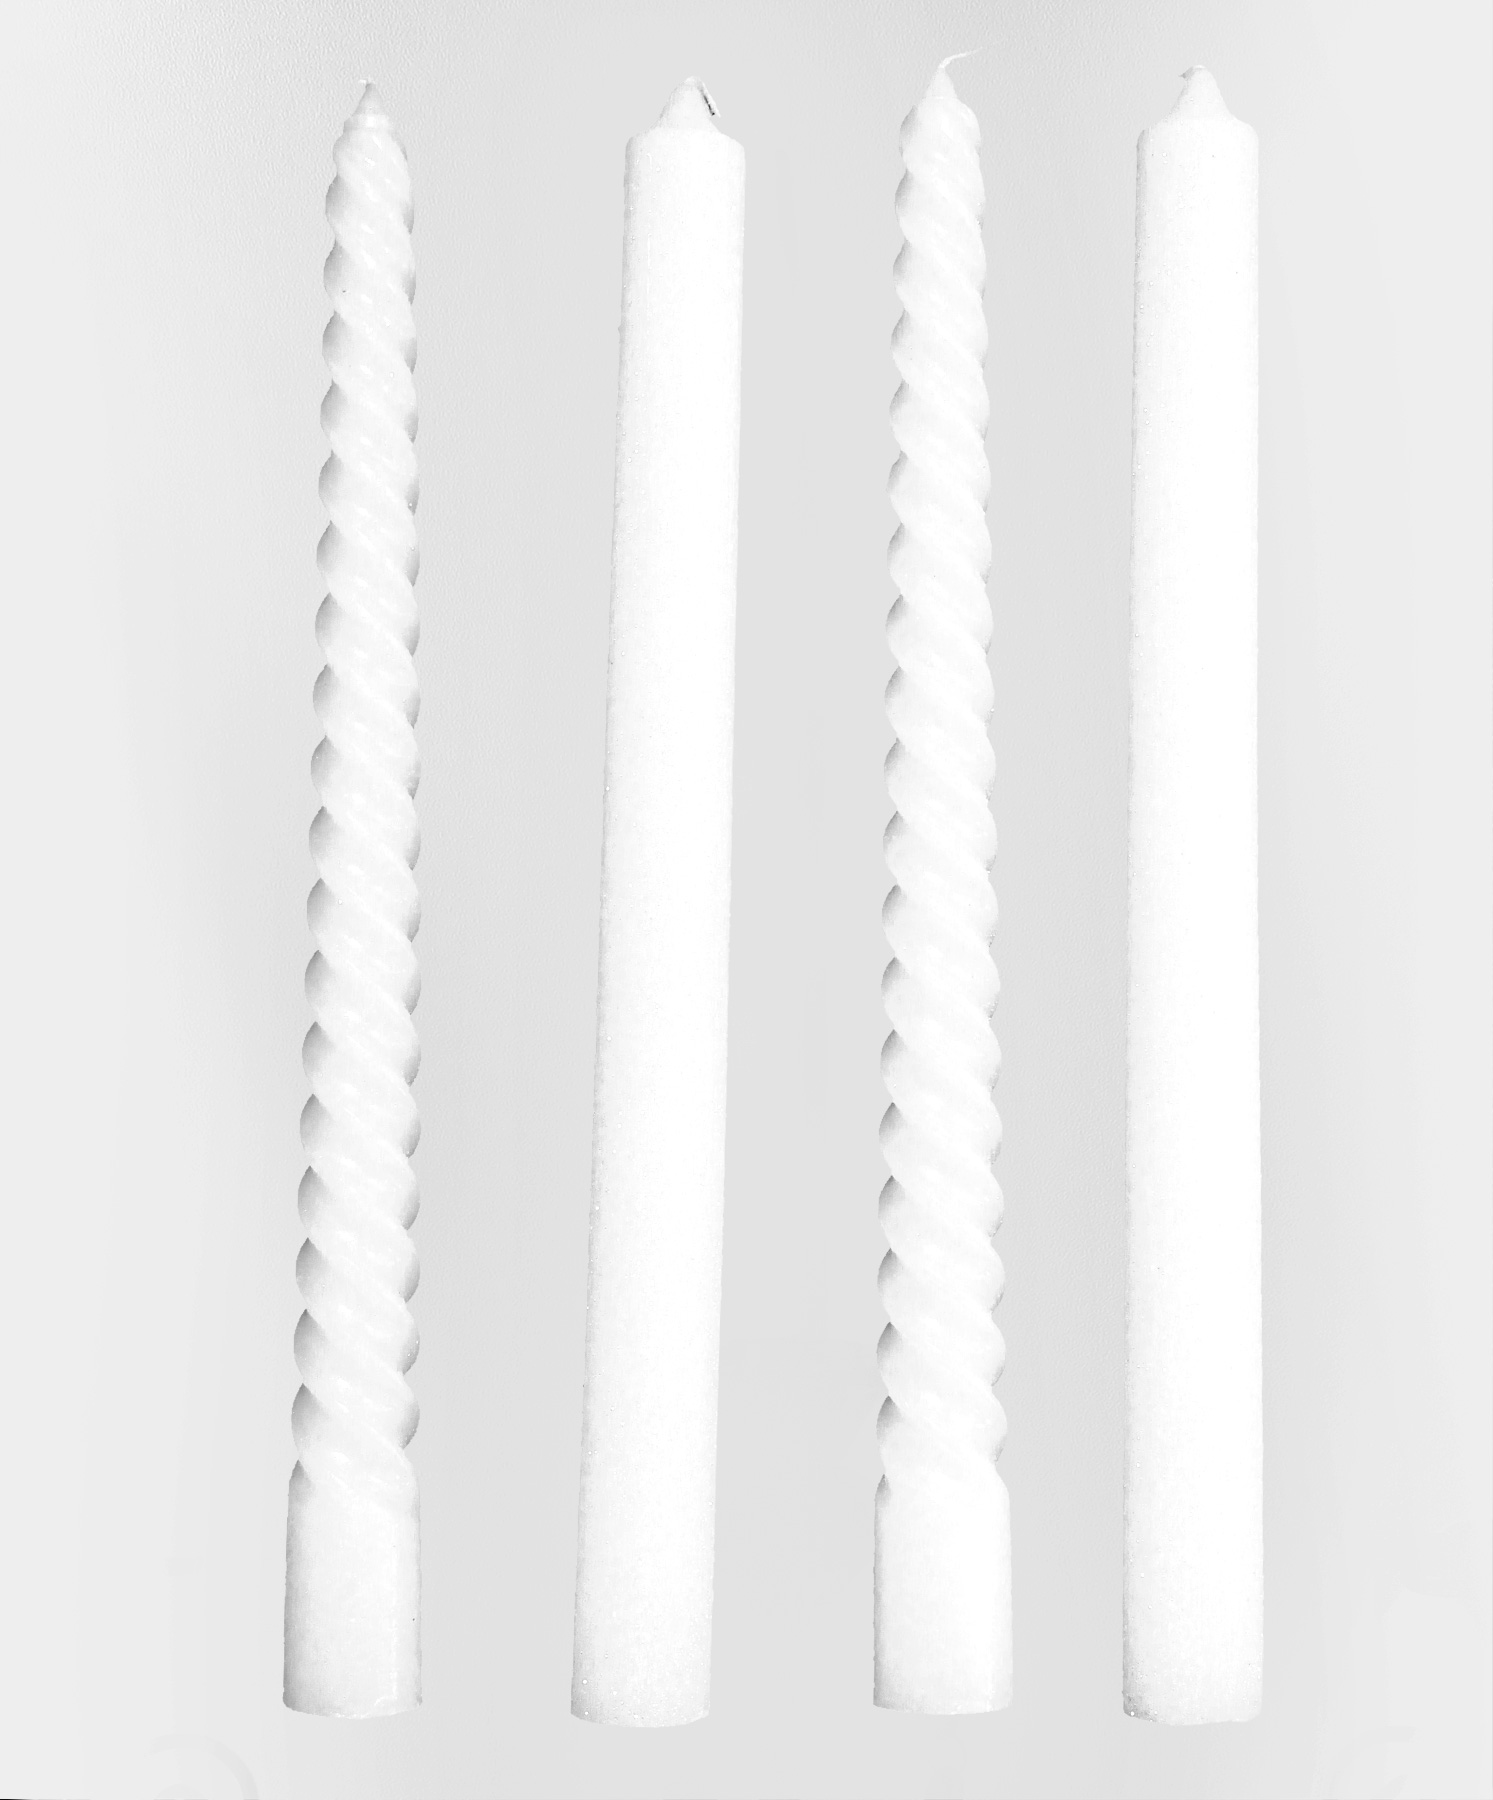 4 bougies blanches pour chandelier d coration. Black Bedroom Furniture Sets. Home Design Ideas